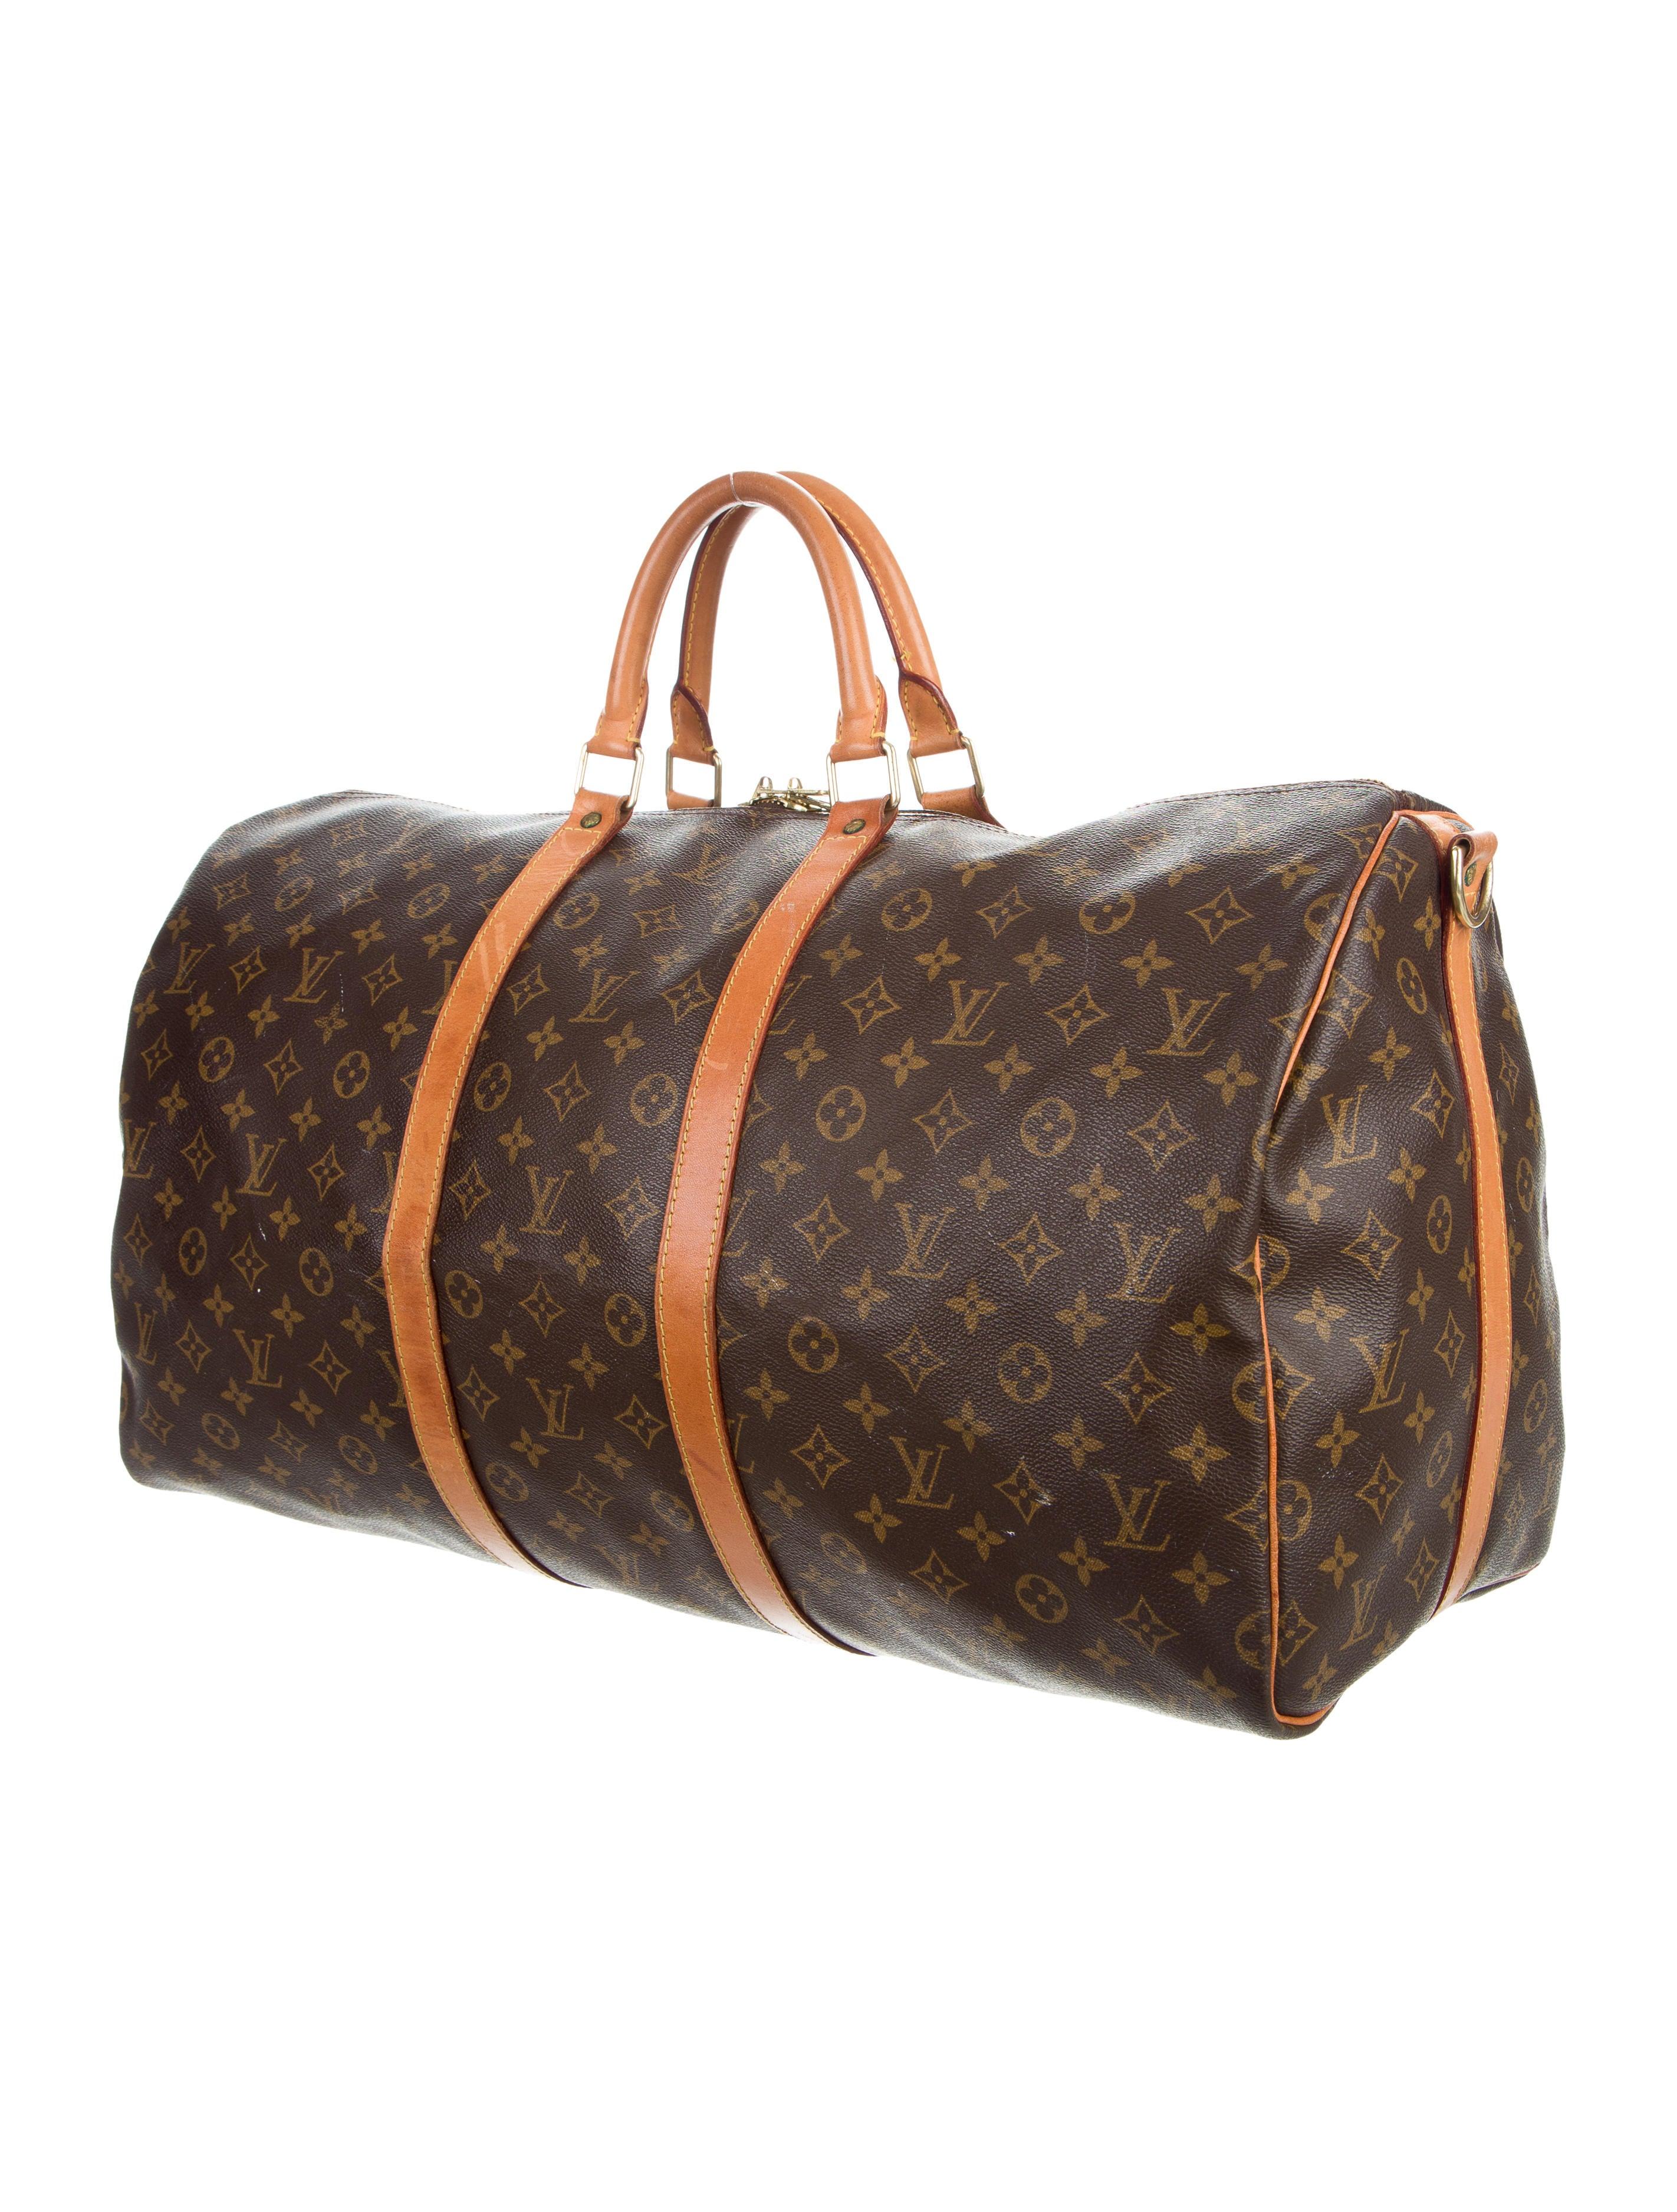 louis vuitton monogram keepall bandouli re 55 bags lou139908 the realreal. Black Bedroom Furniture Sets. Home Design Ideas